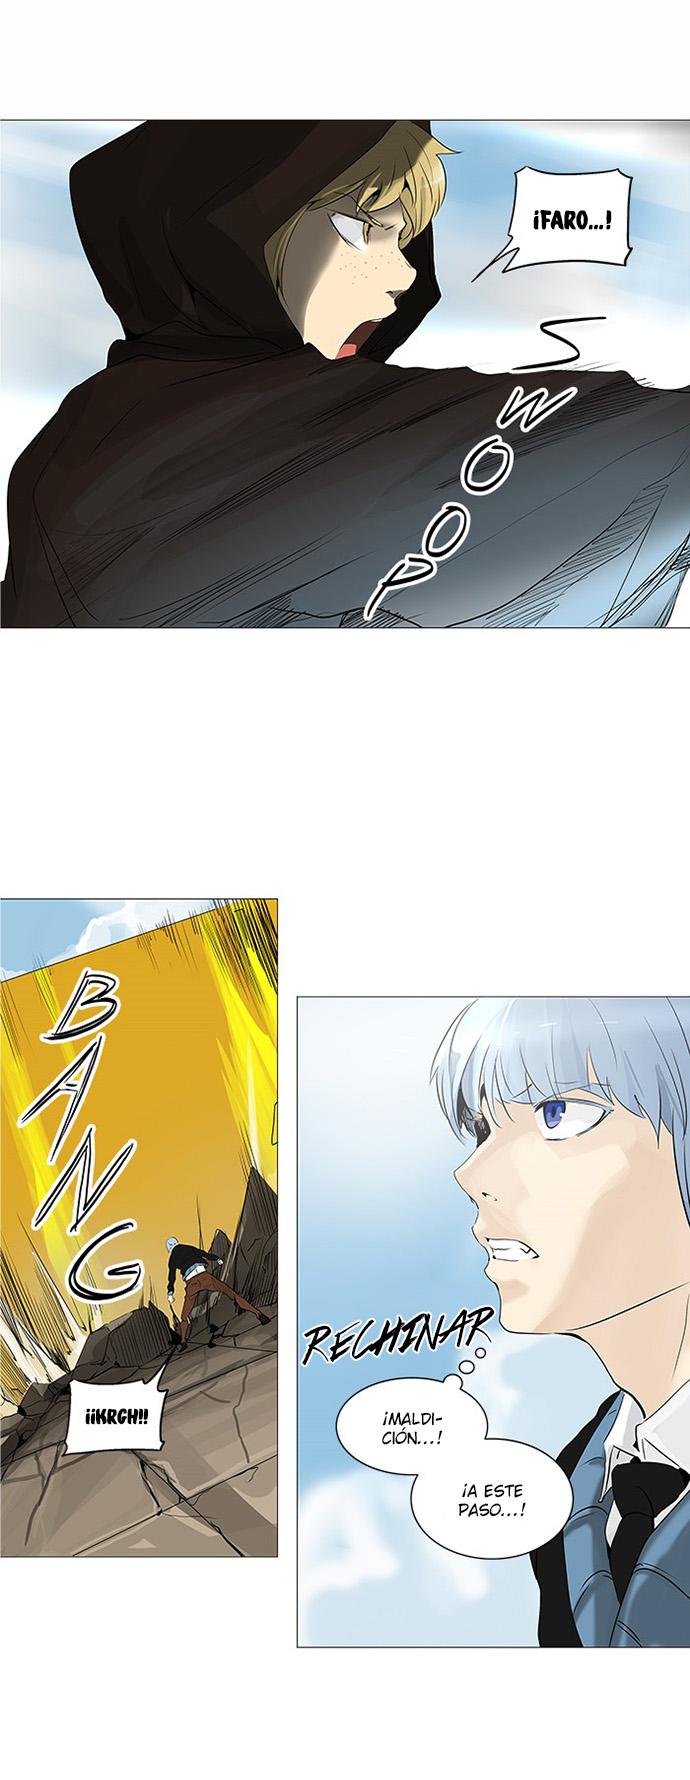 https://c5.ninemanga.com/es_manga/21/149/365457/6802ac2b9aea82a7d56af8b899befea9.jpg Page 6